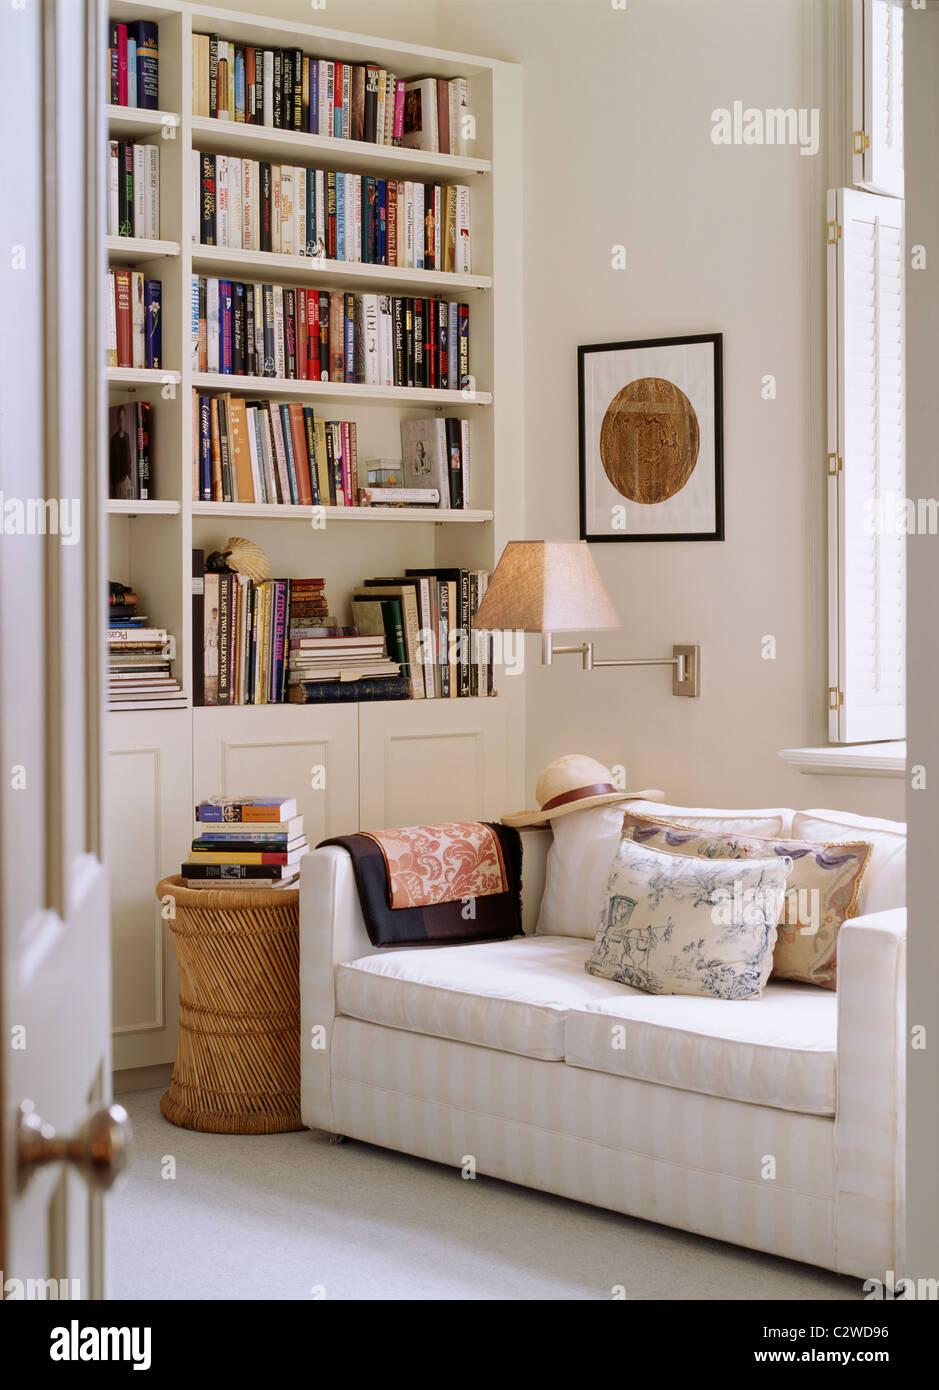 Library Reading Room Sofa Shelves Stock Photo Alamy